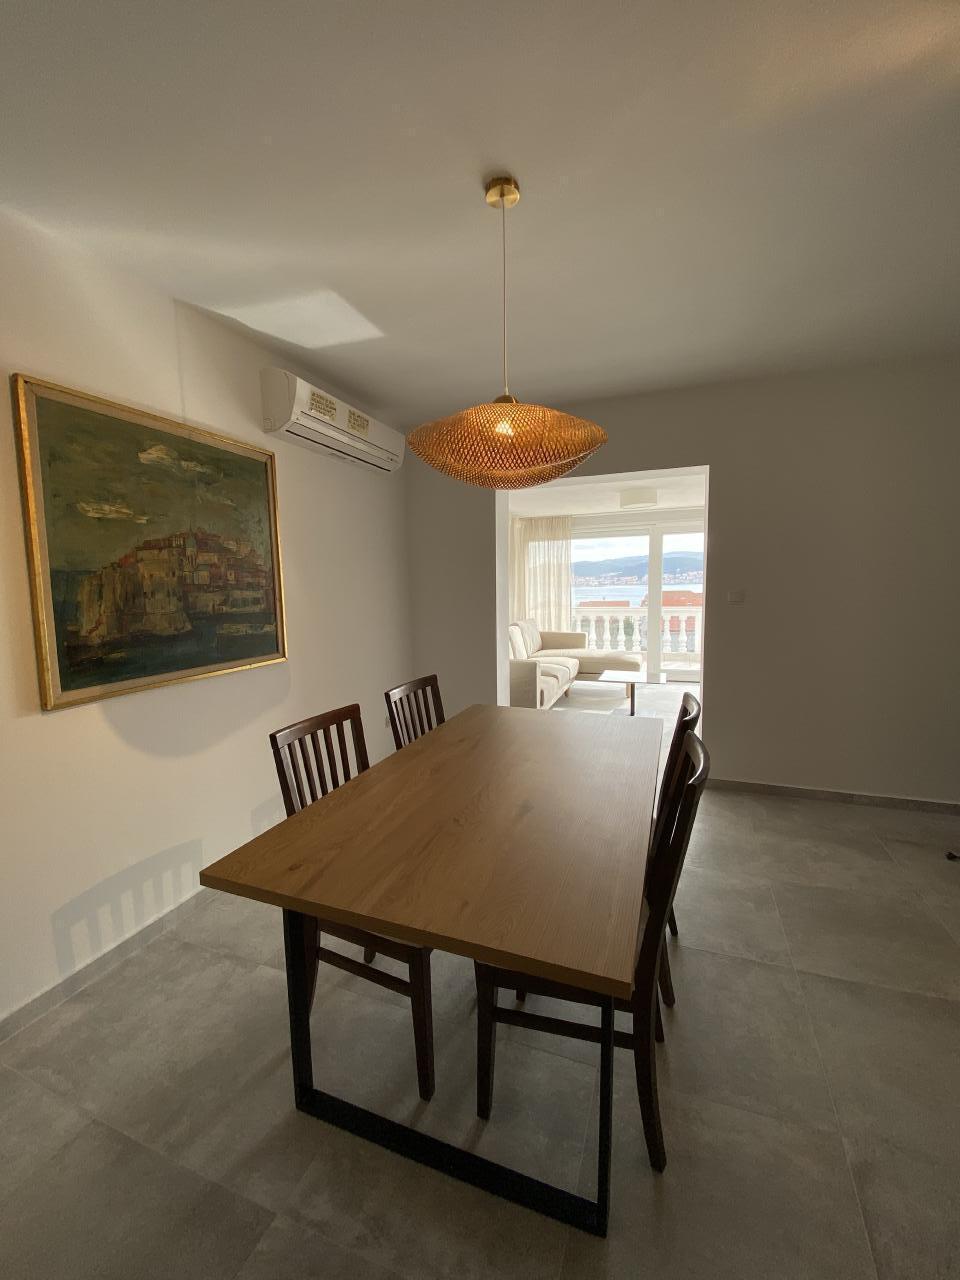 Ferienwohnung Casa Anica Apartment Bellevue (656993), Kuciste, Insel Peljesac, Dalmatien, Kroatien, Bild 15